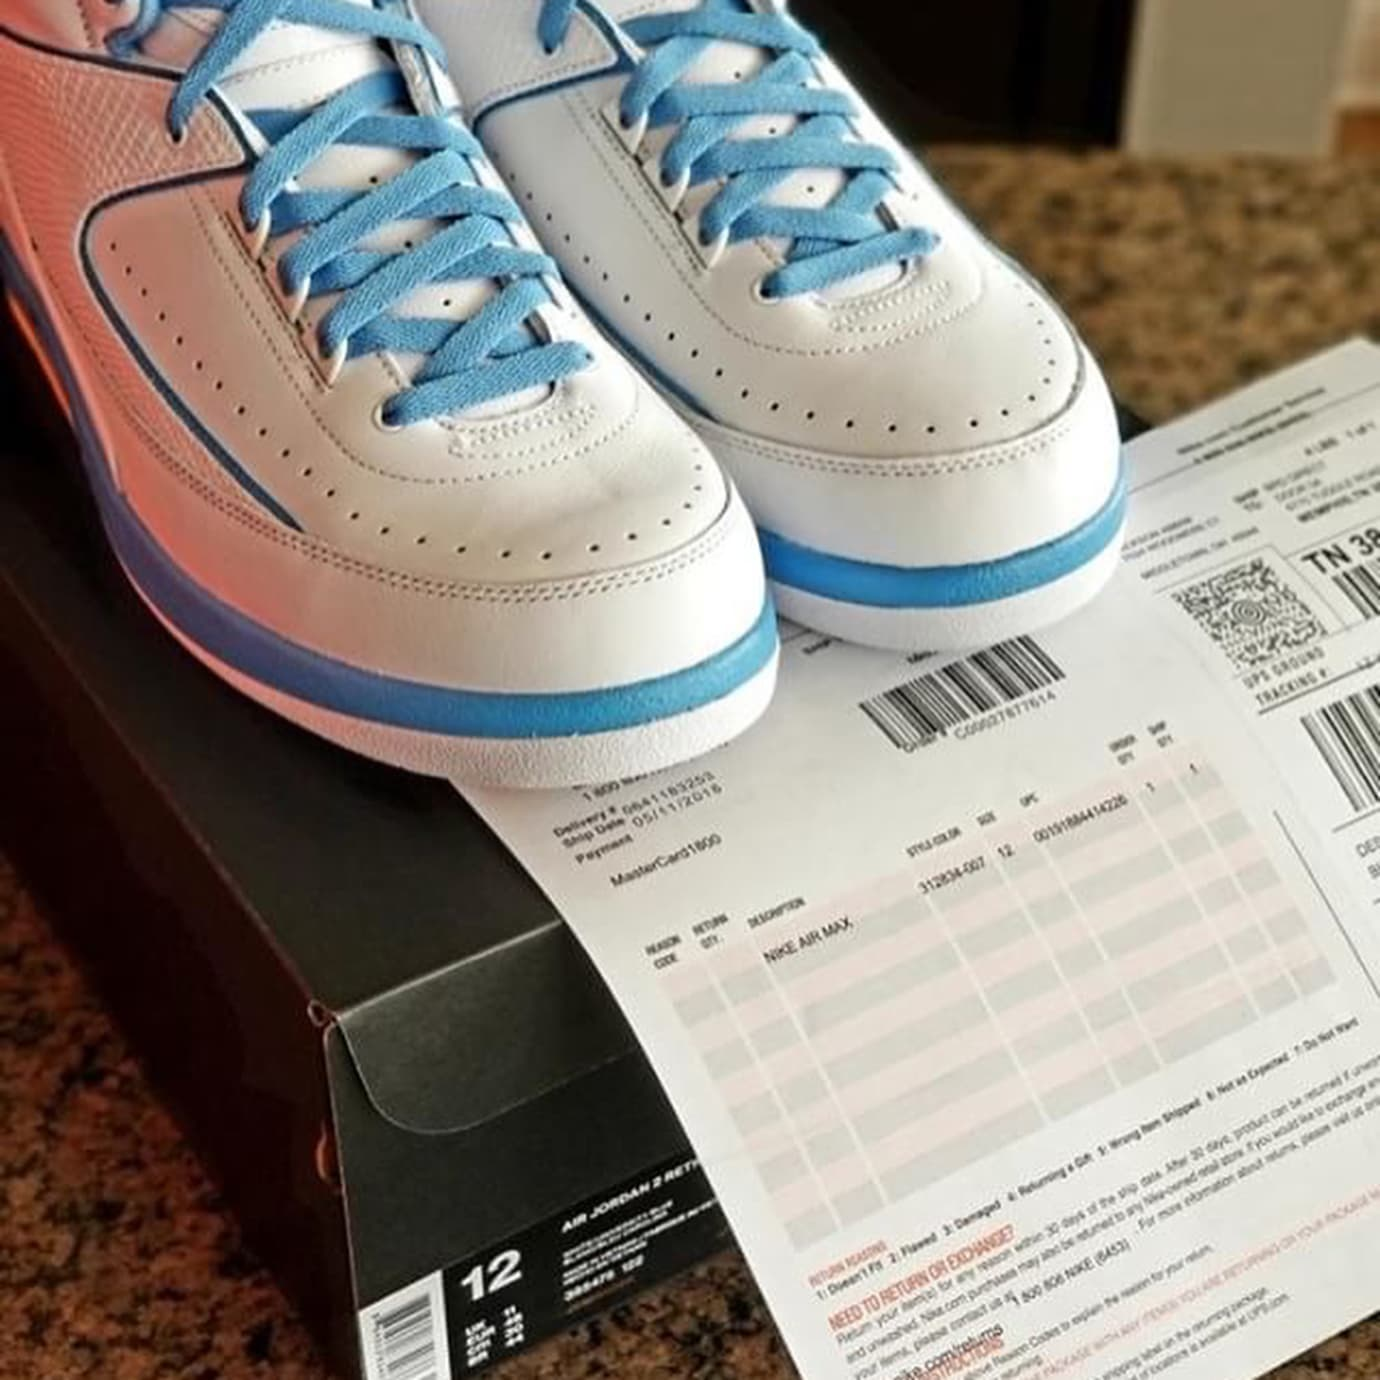 Image via Nike Air Jordan 2 II Melo 2018 Release Date 385475-122 Box 940a2755e